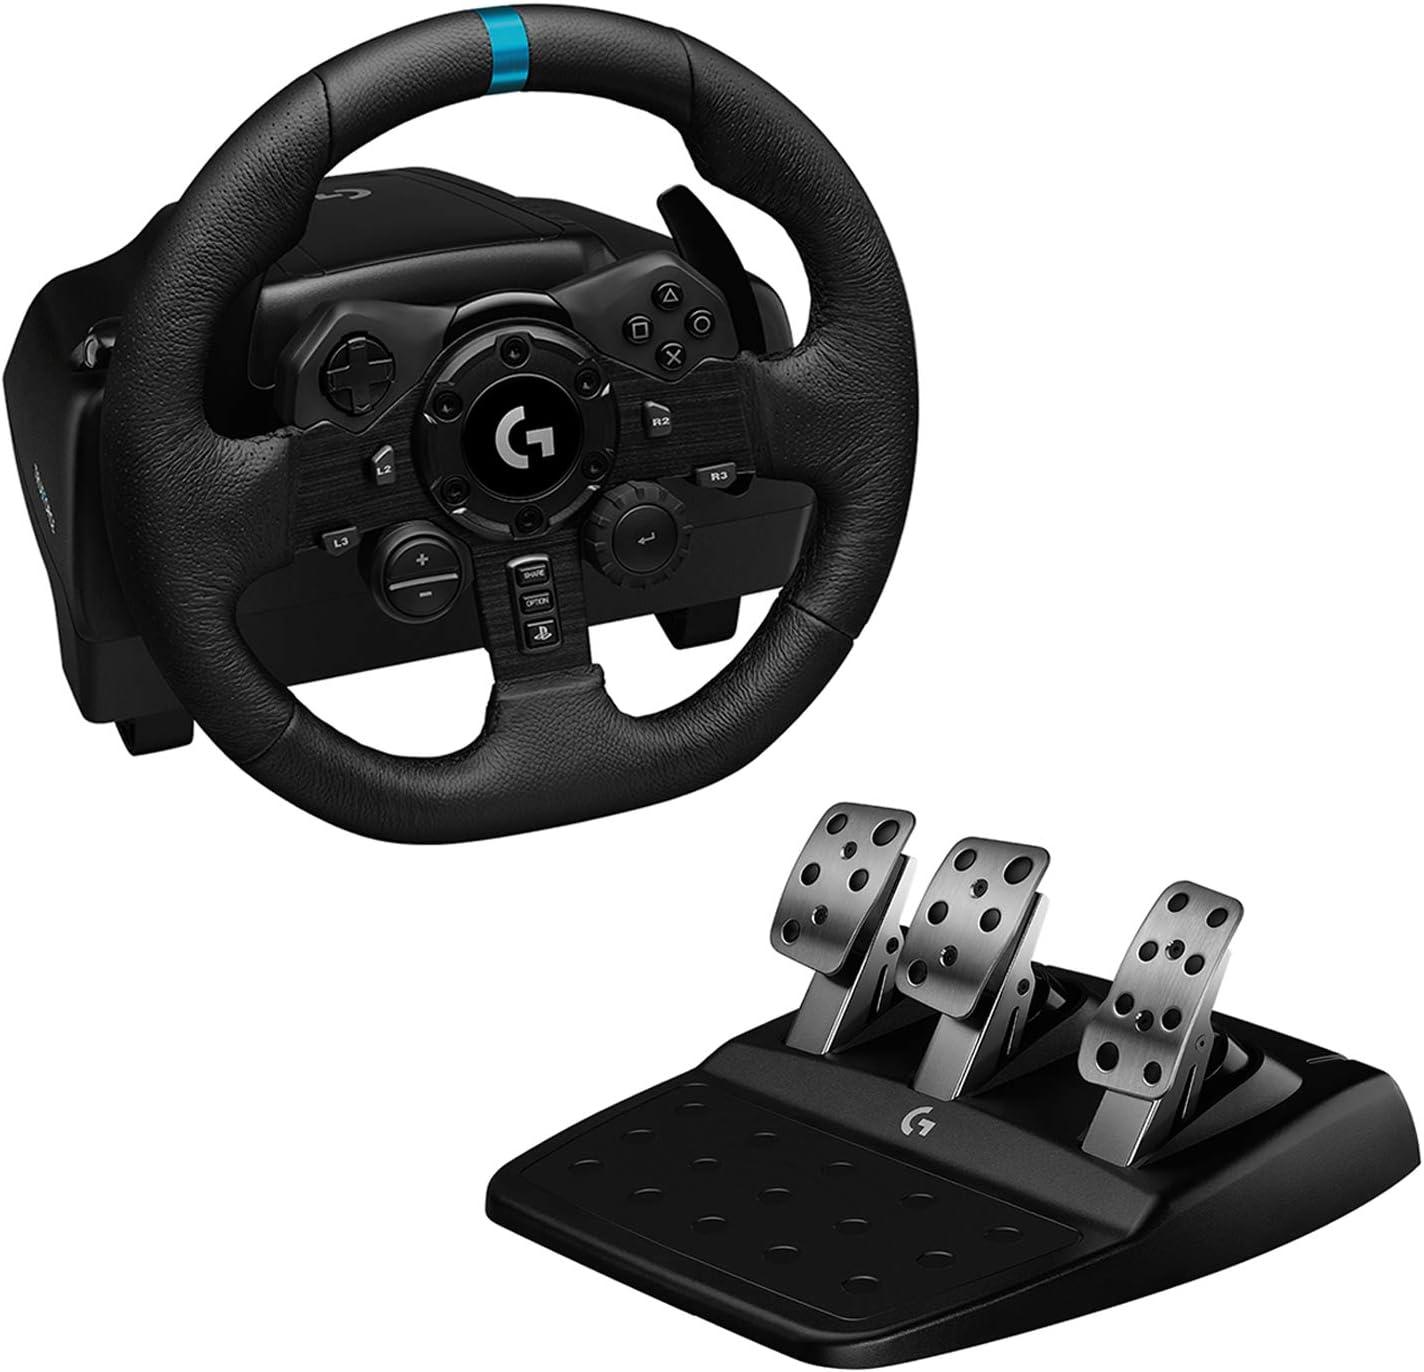 Logitech G923 TRUEFORCE Racing Wheel & Pedals $347.77 Coupon